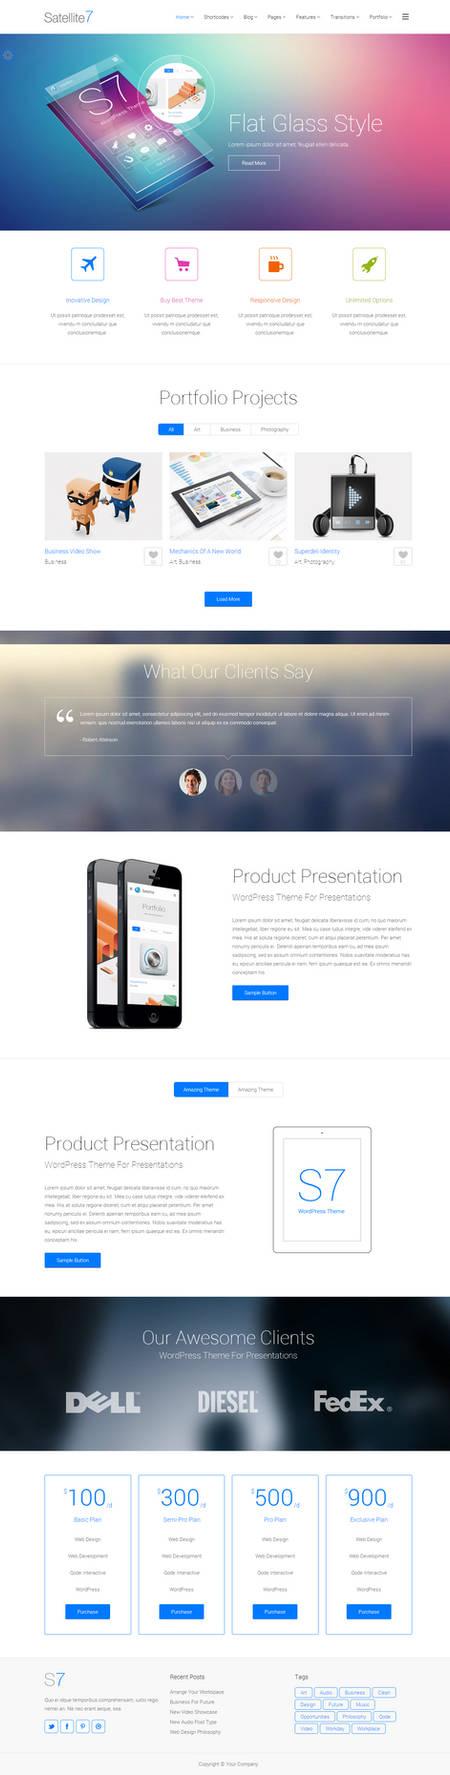 Satellite7 WordPress Theme by wpthemes